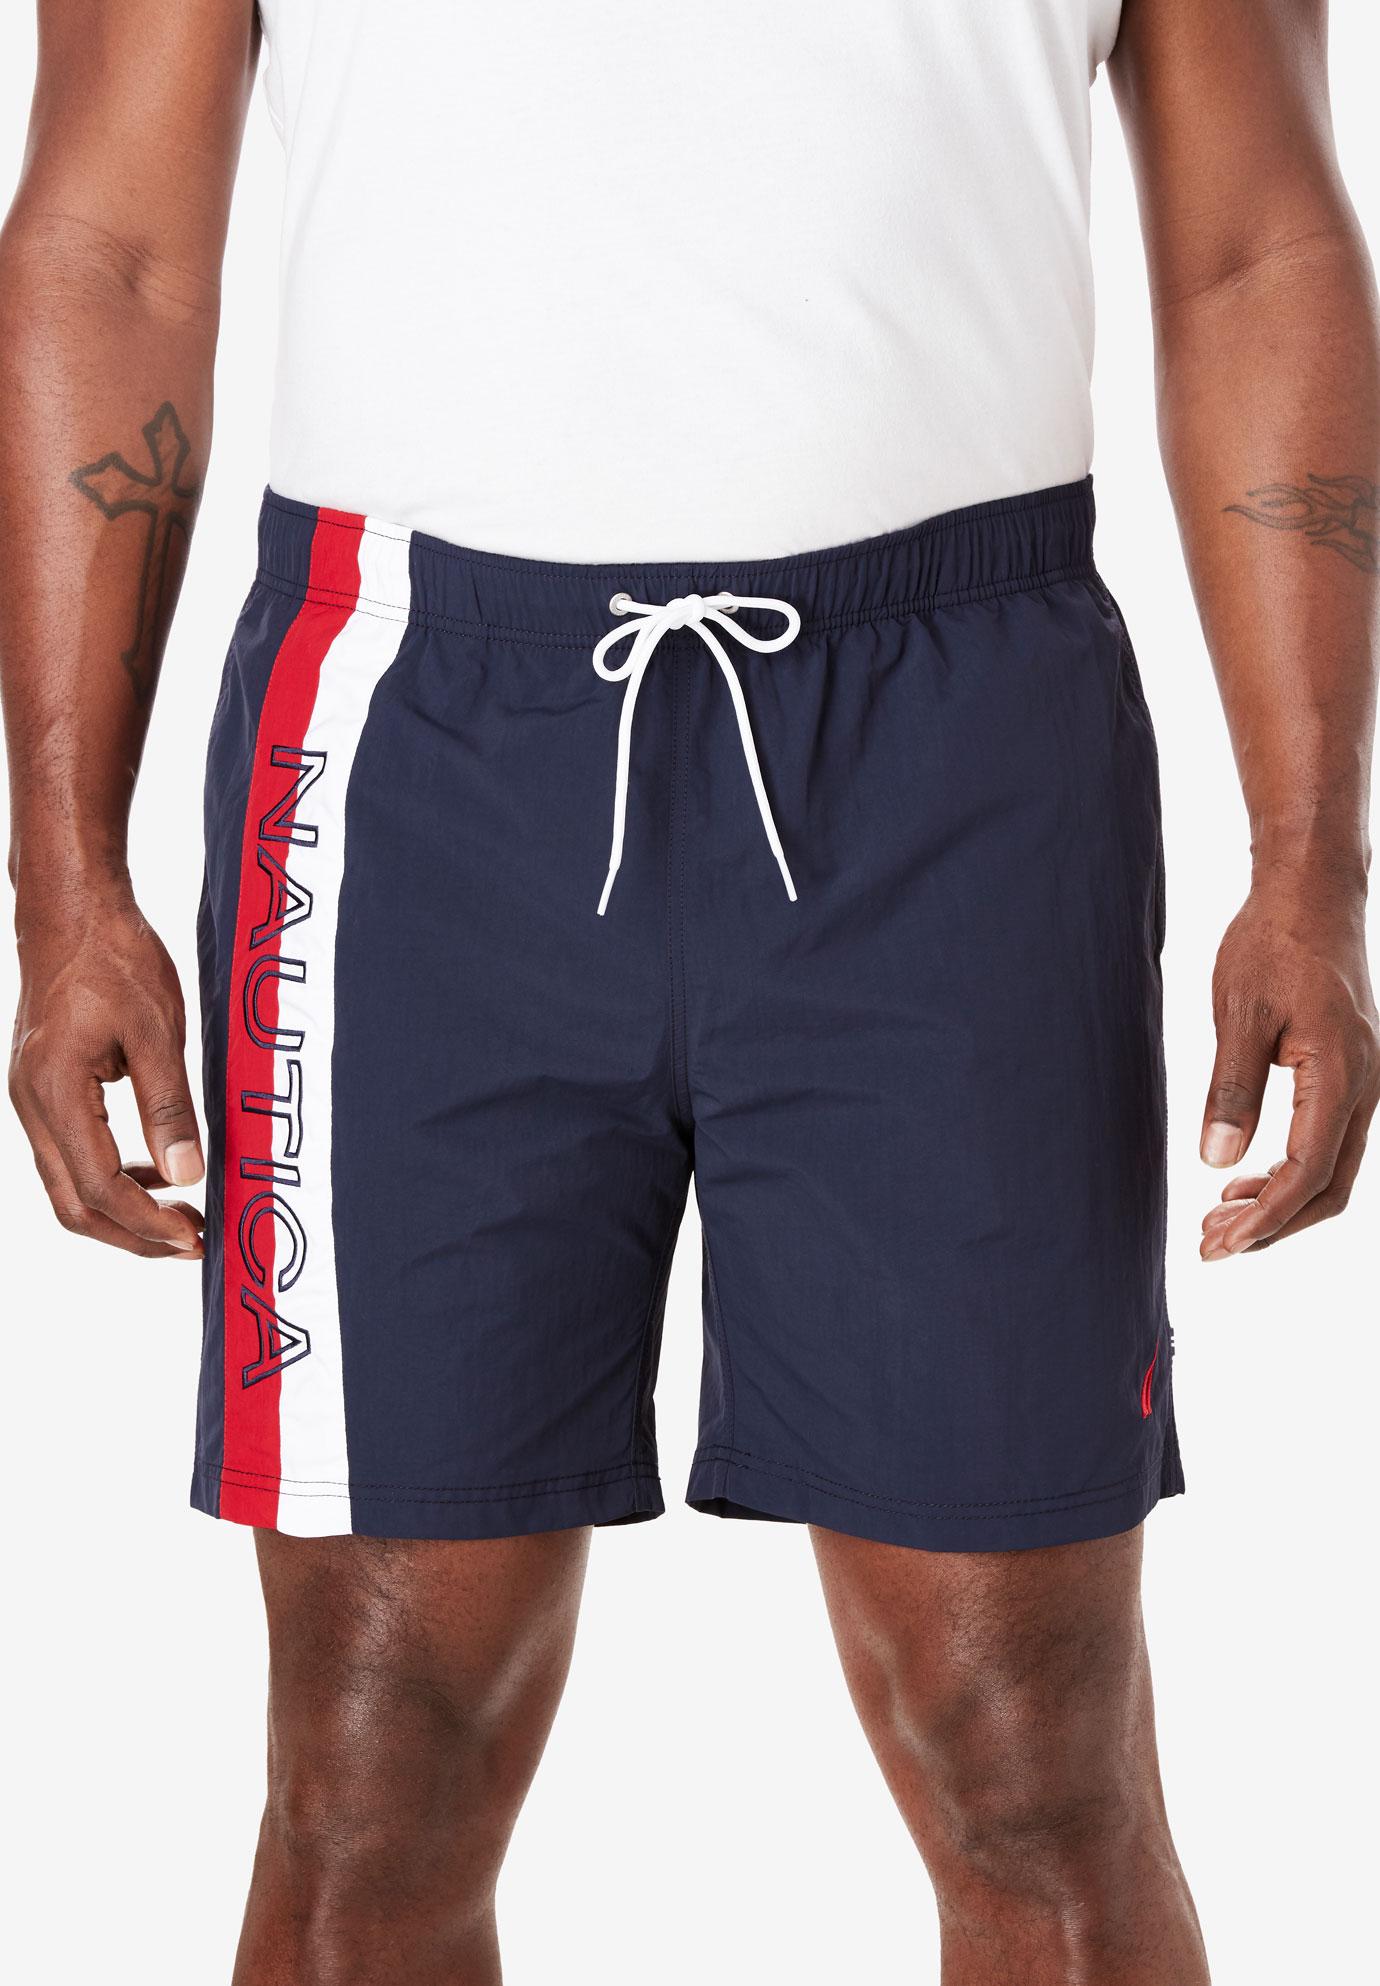 c1d4d11896 Nautica® Quick Dry Print Swim Shorts| Big and Tall Pants & Shorts ...